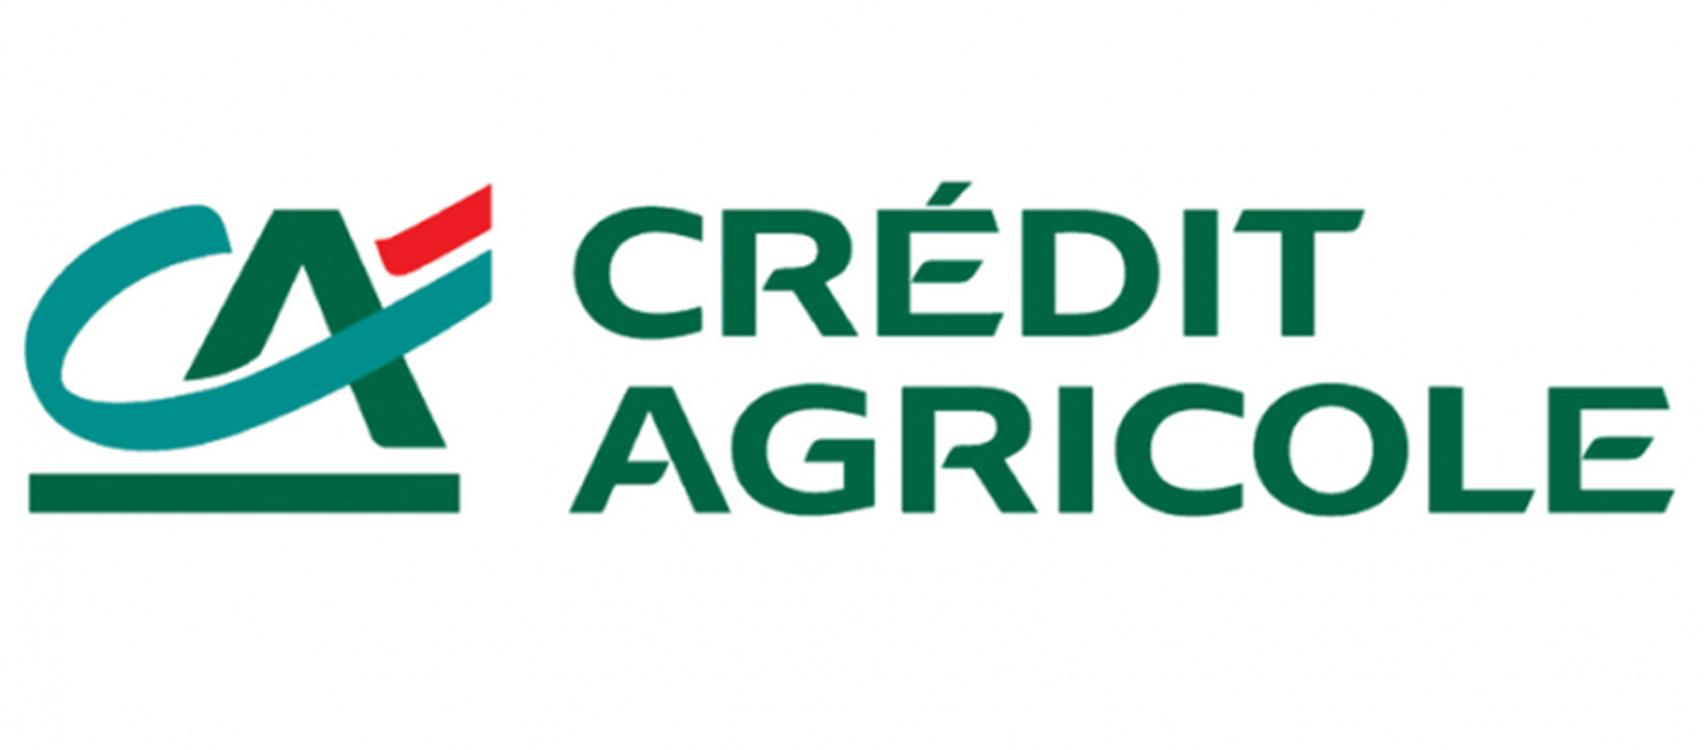 Credit Agricole  (погашення кредиту)